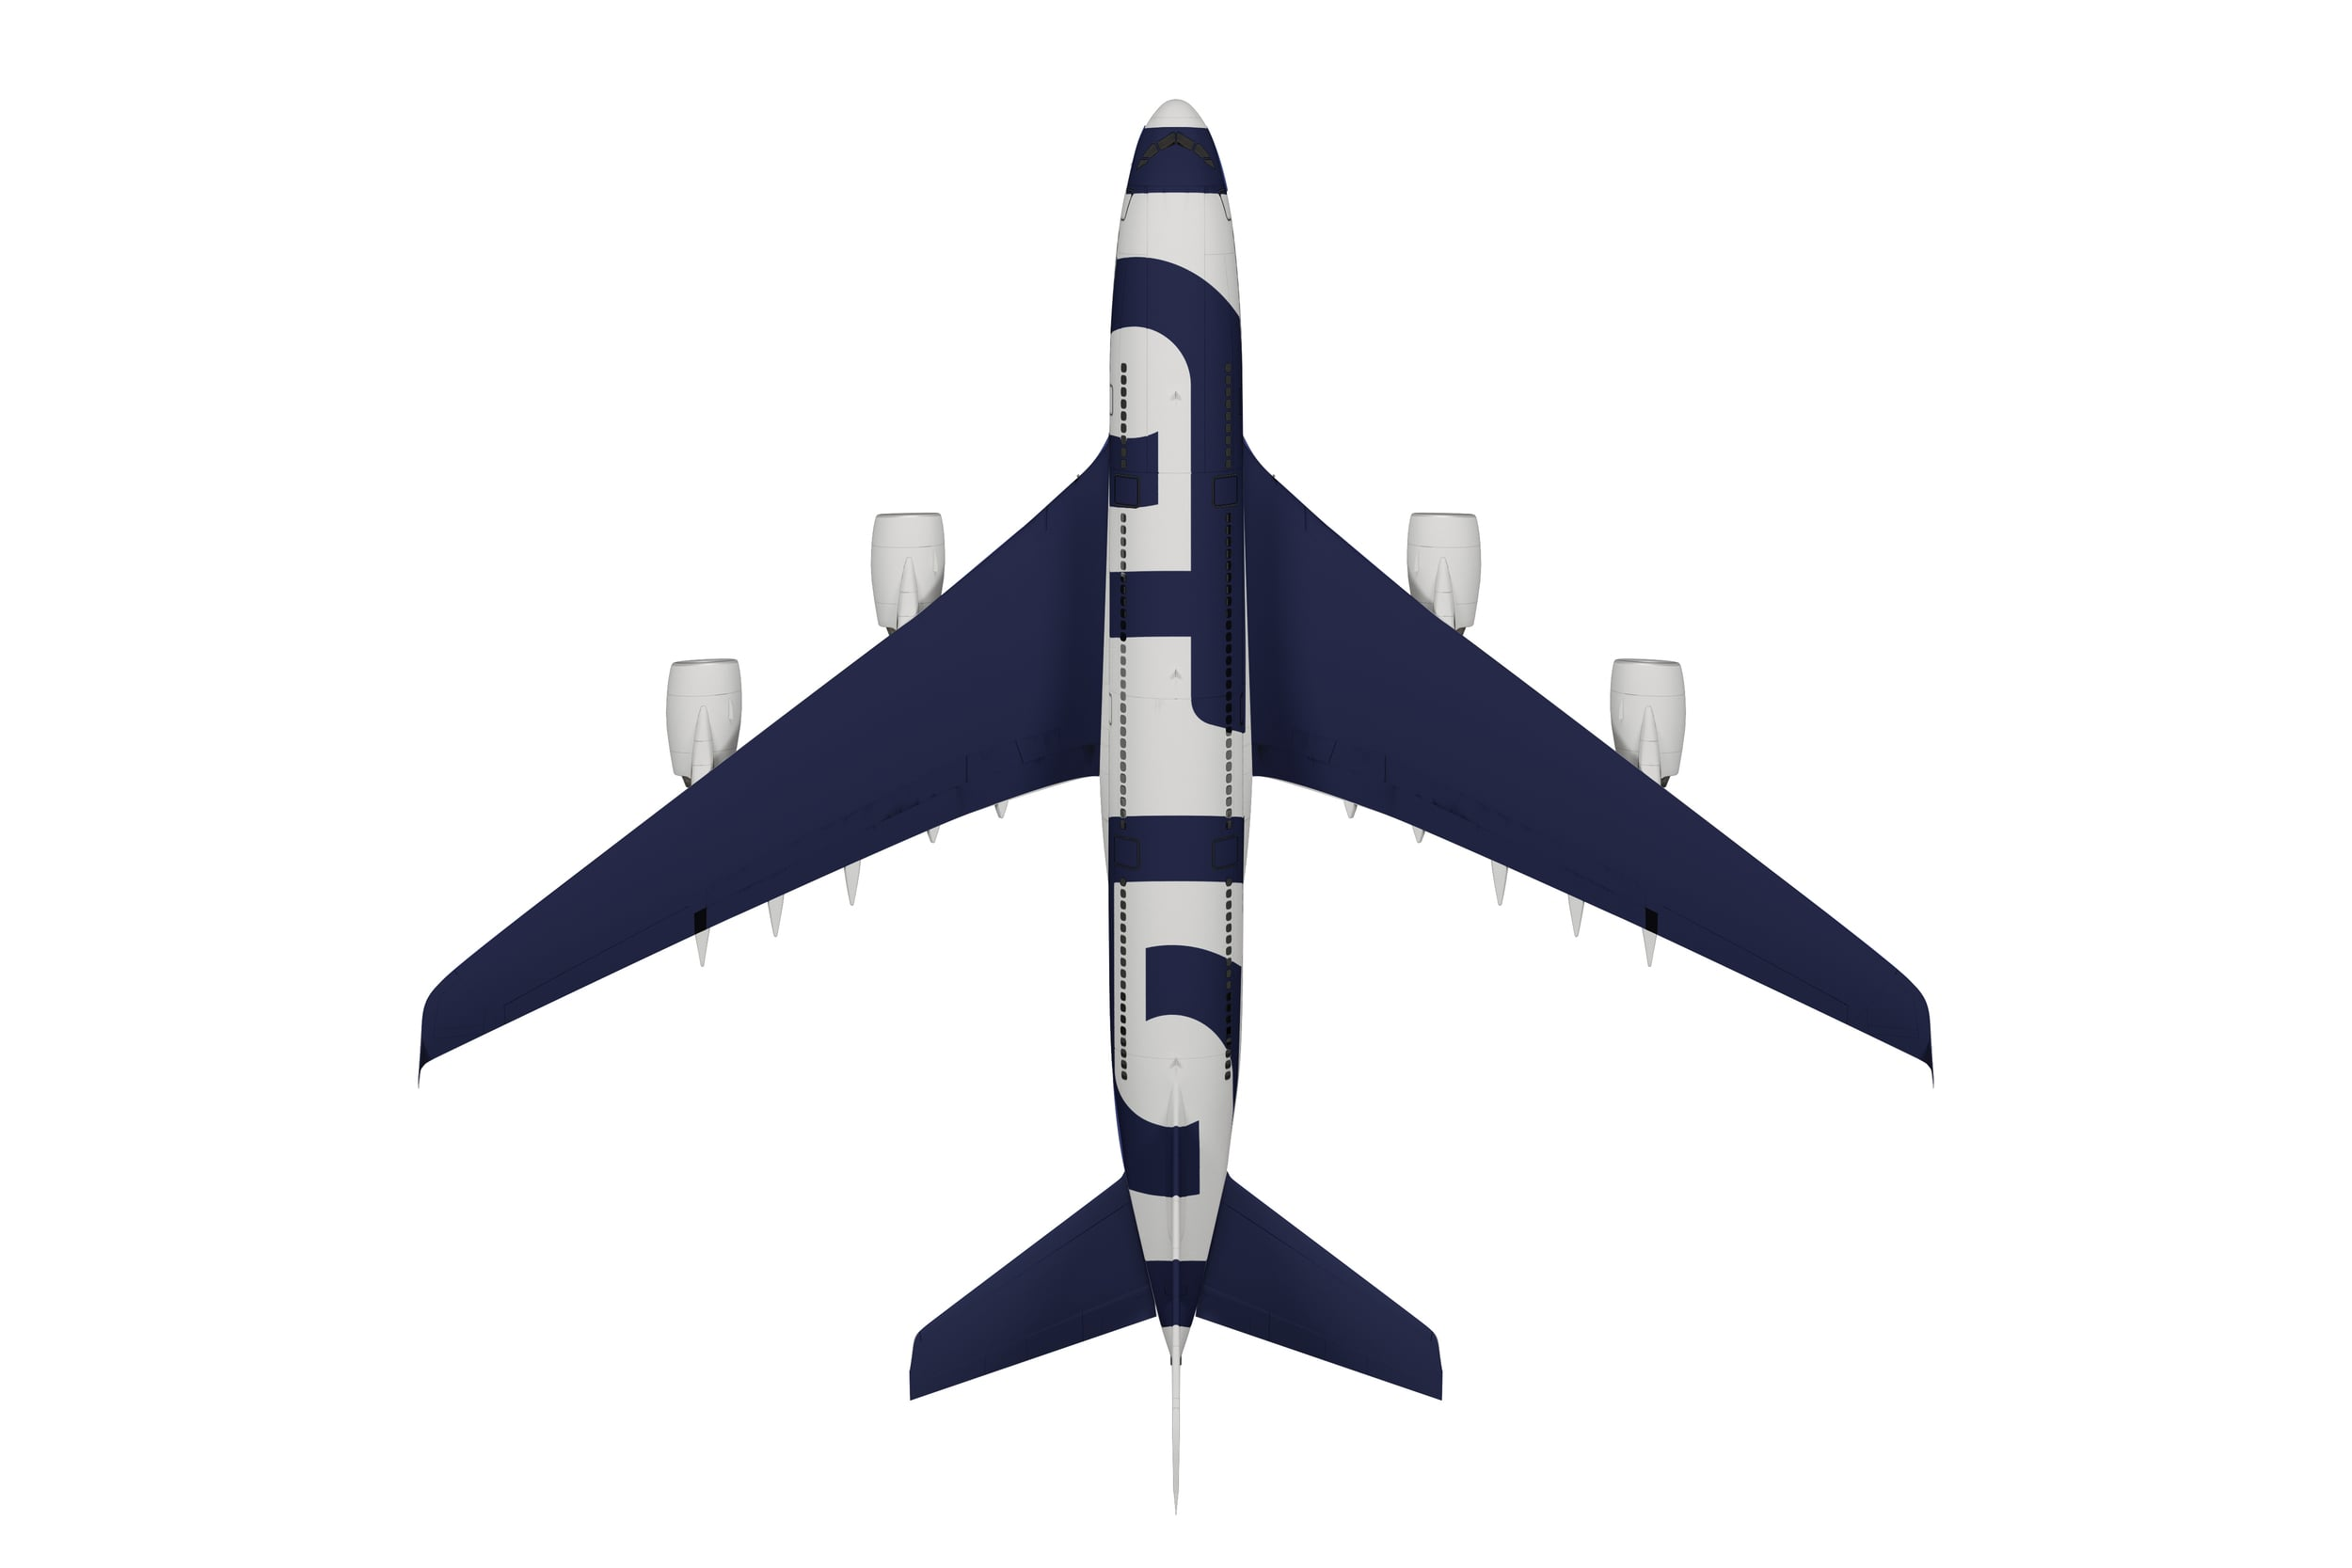 5_plane_above-view.jpg